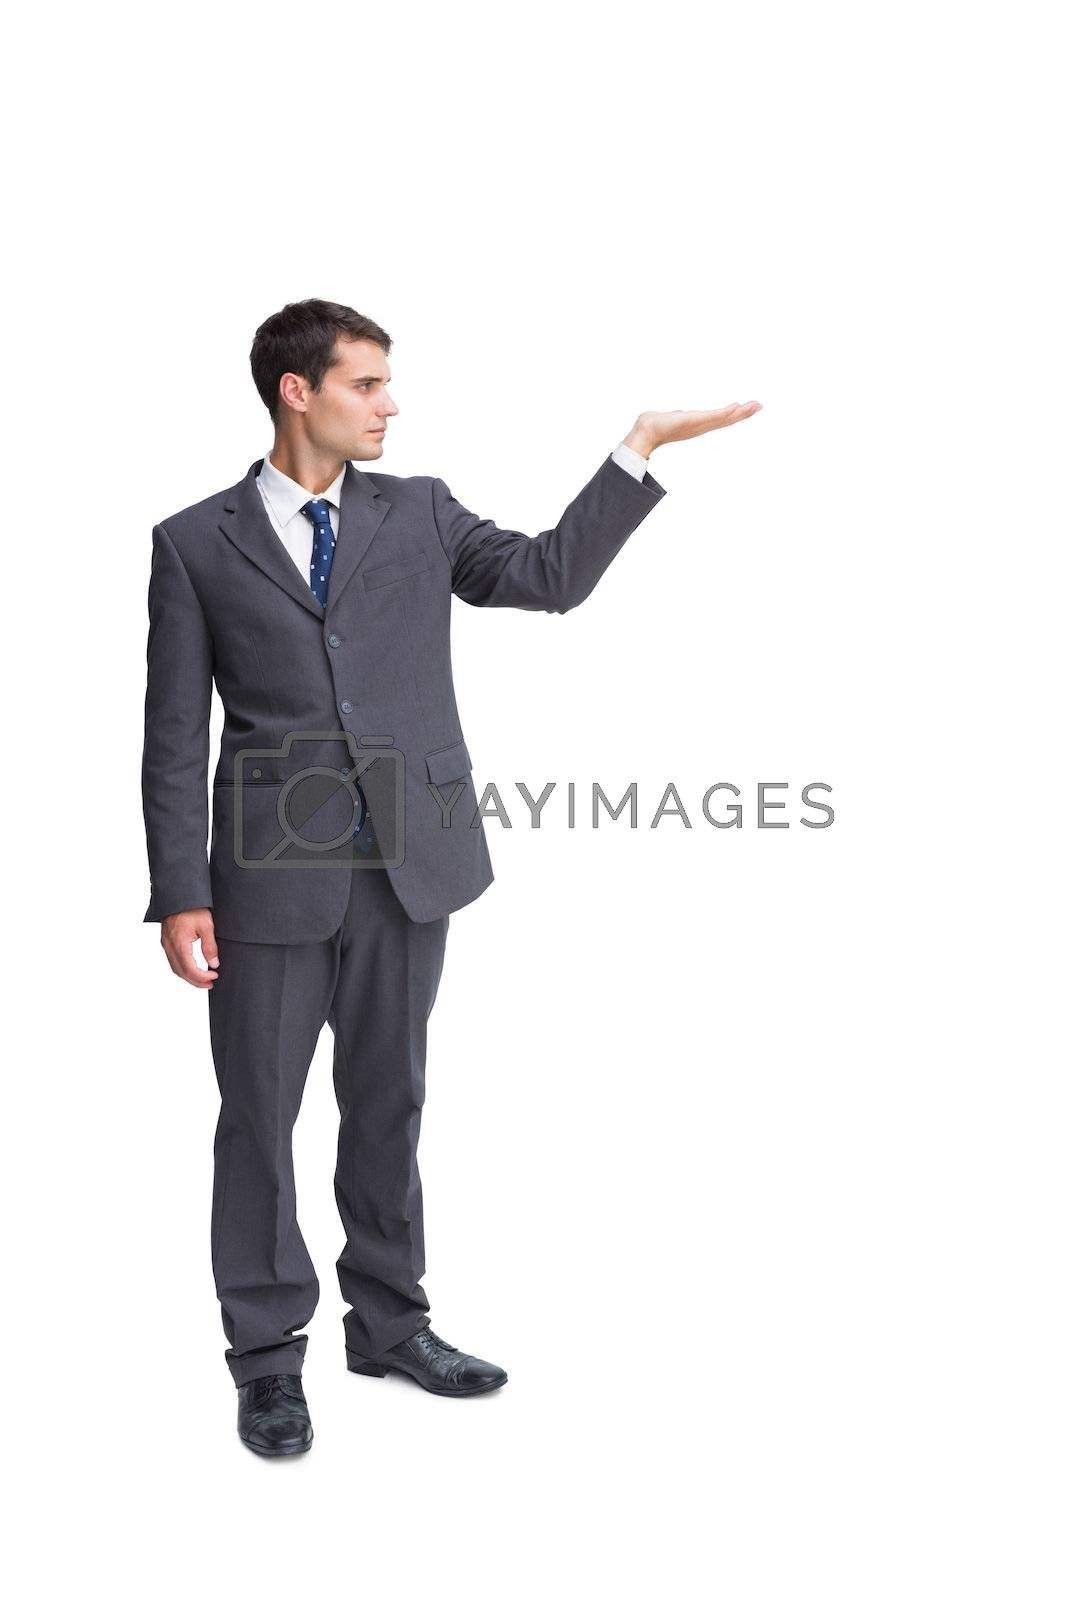 Businessman presenting something by Wavebreakmedia